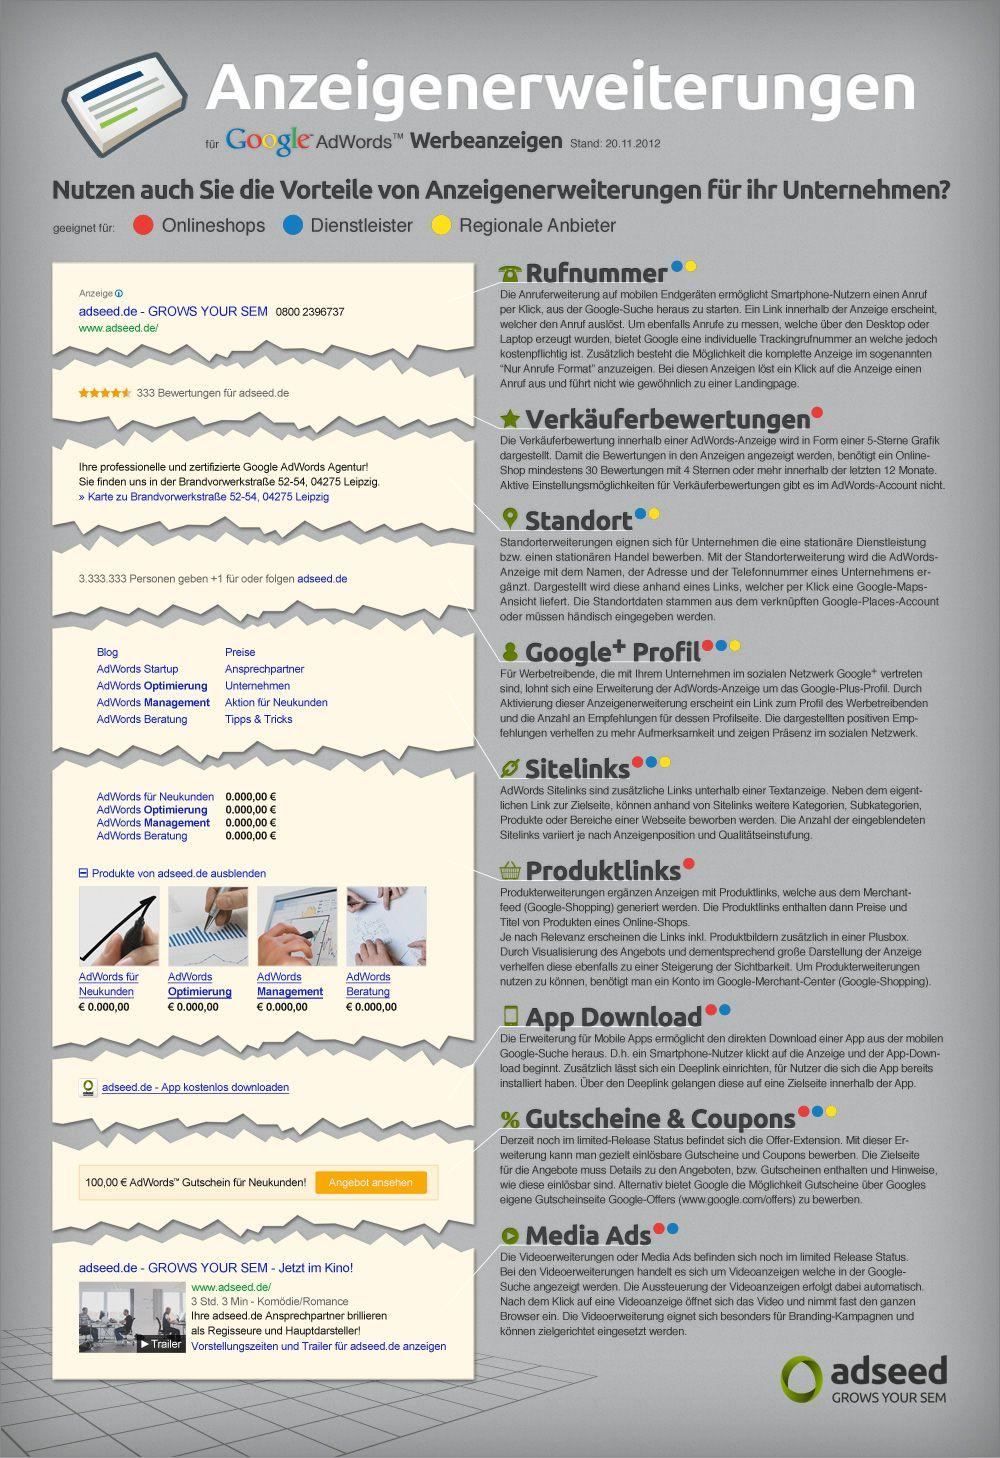 Advertising-Infographics-wwwadseedde Advertising Infographics : www.adseed.de/...